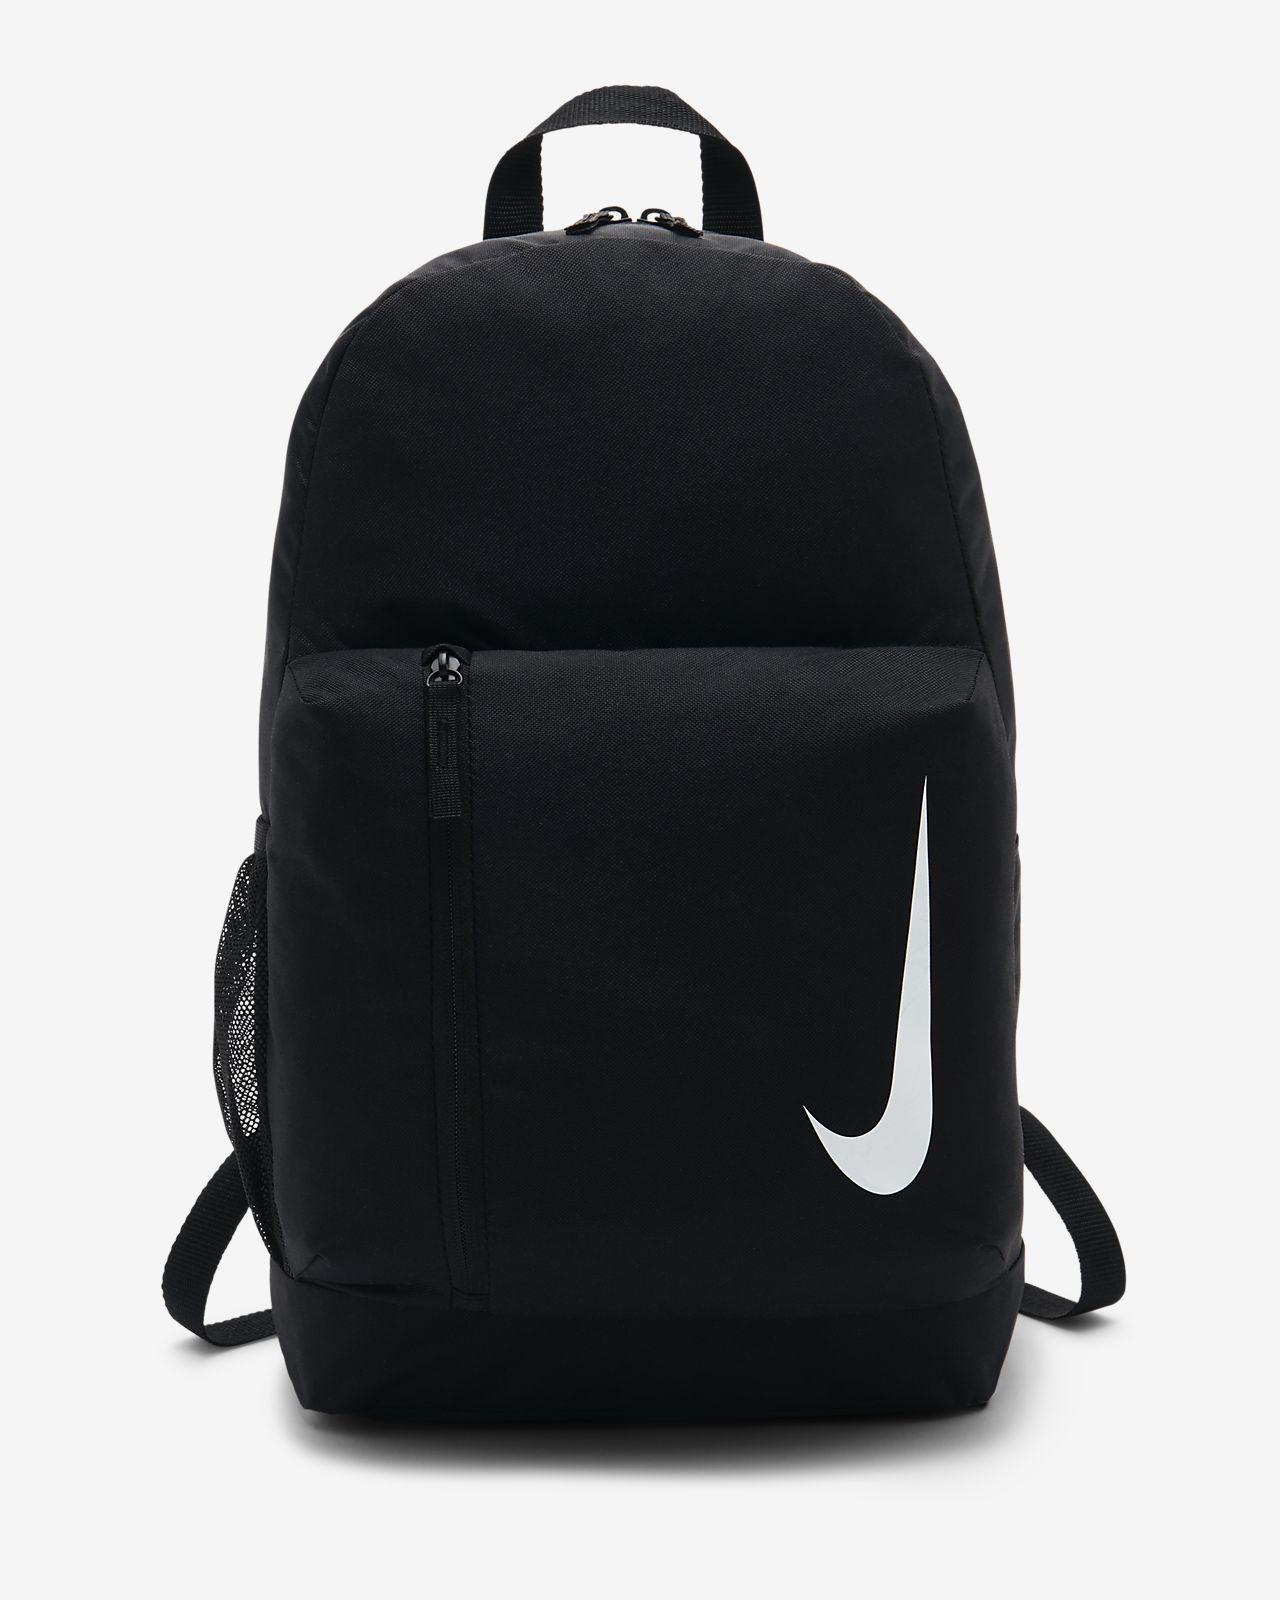 Nike Academy Team Kinder Fussballrucksack